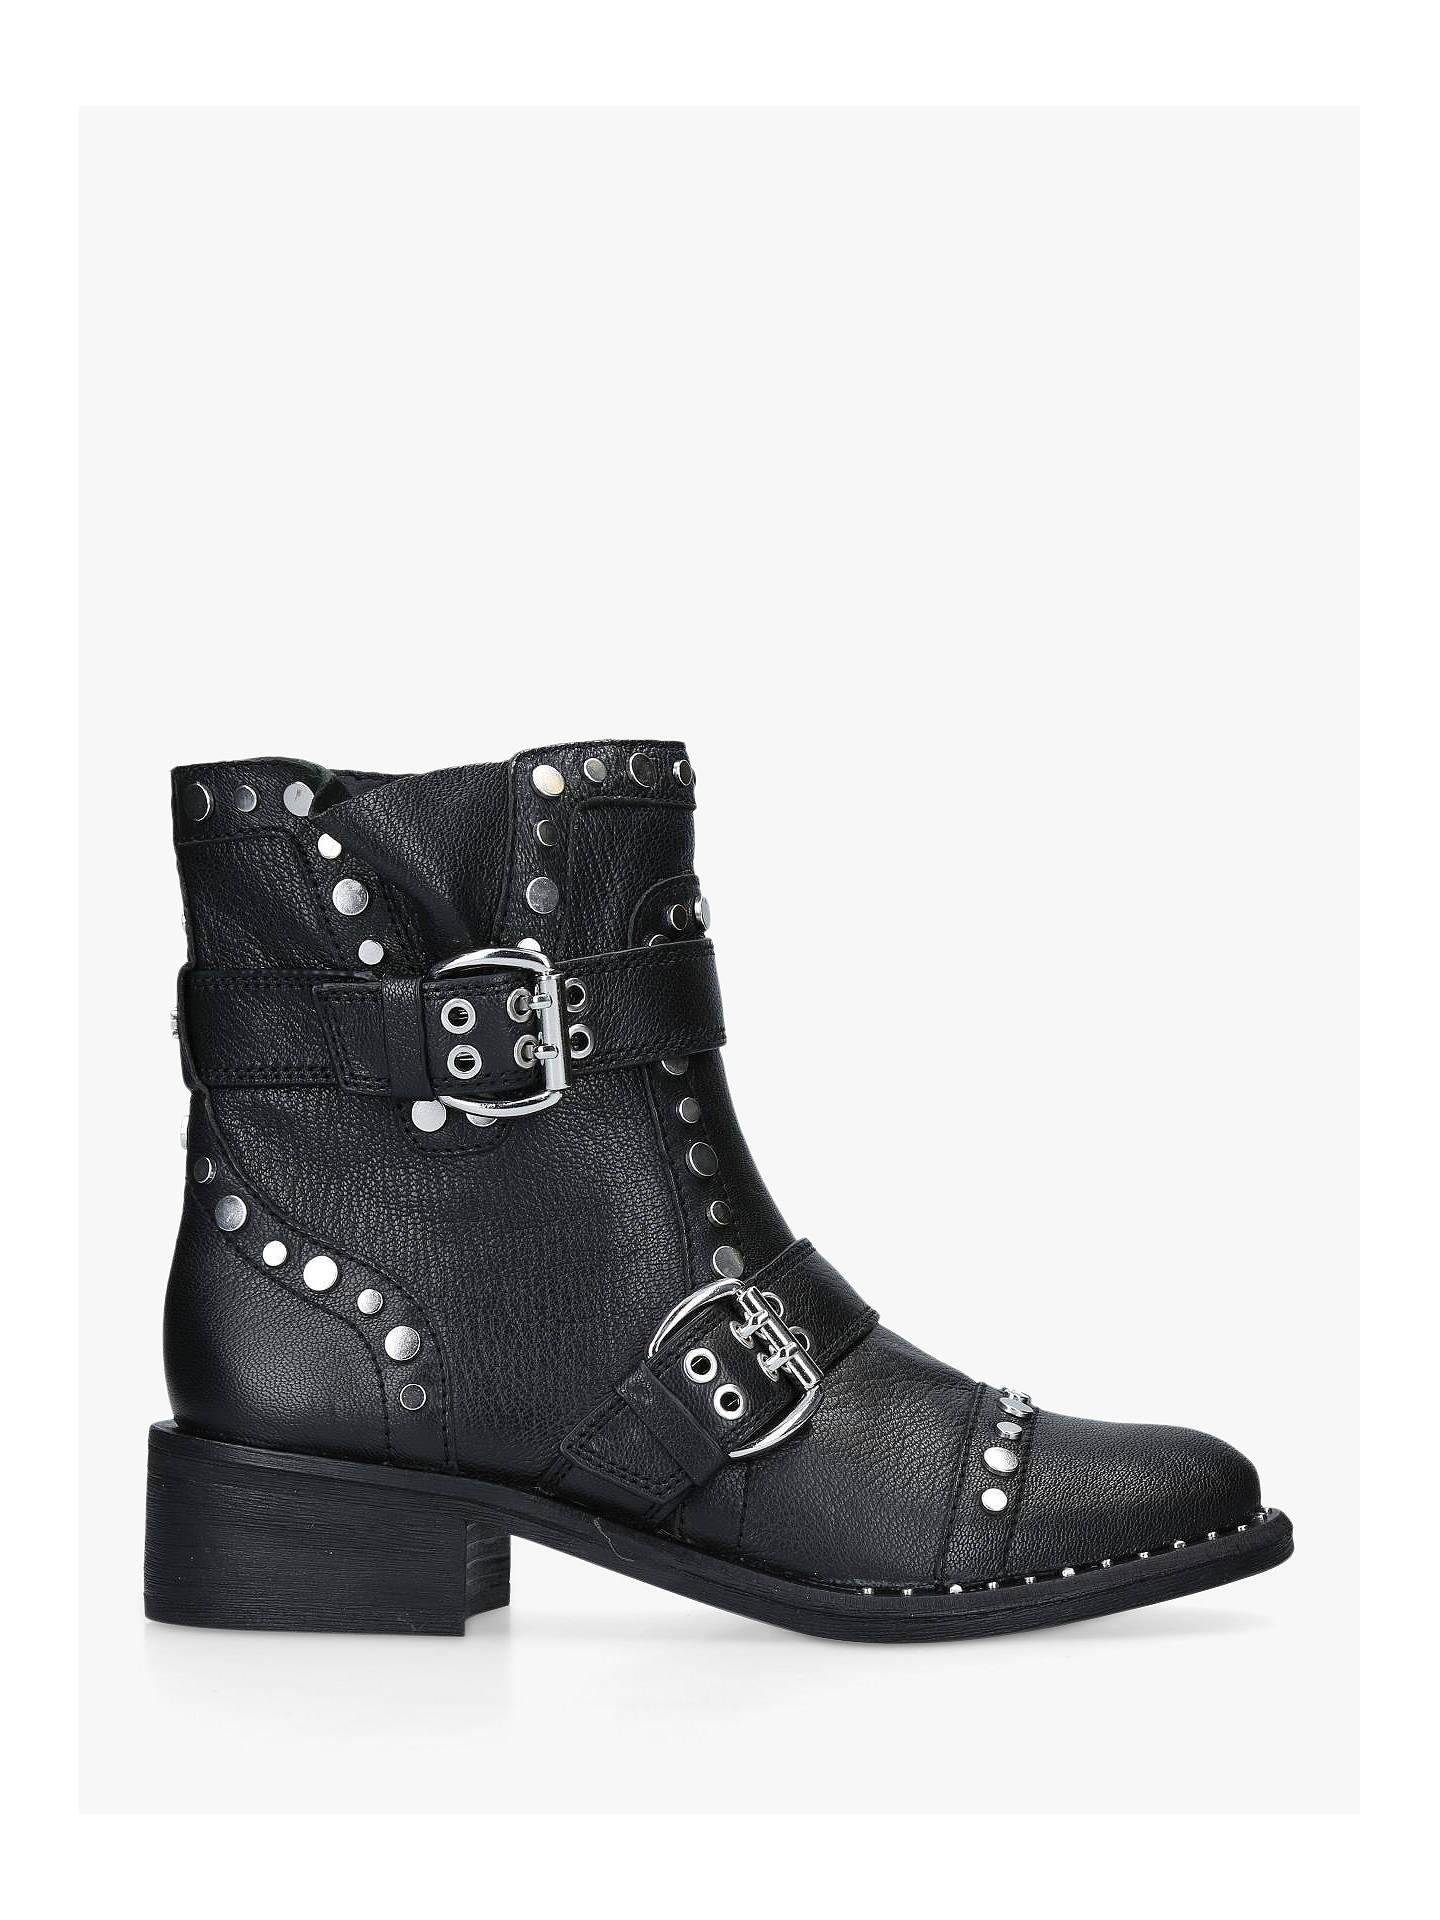 992fa22d1 Buy Sam Edelman Drea Moto Stud Buckle Ankle Boots